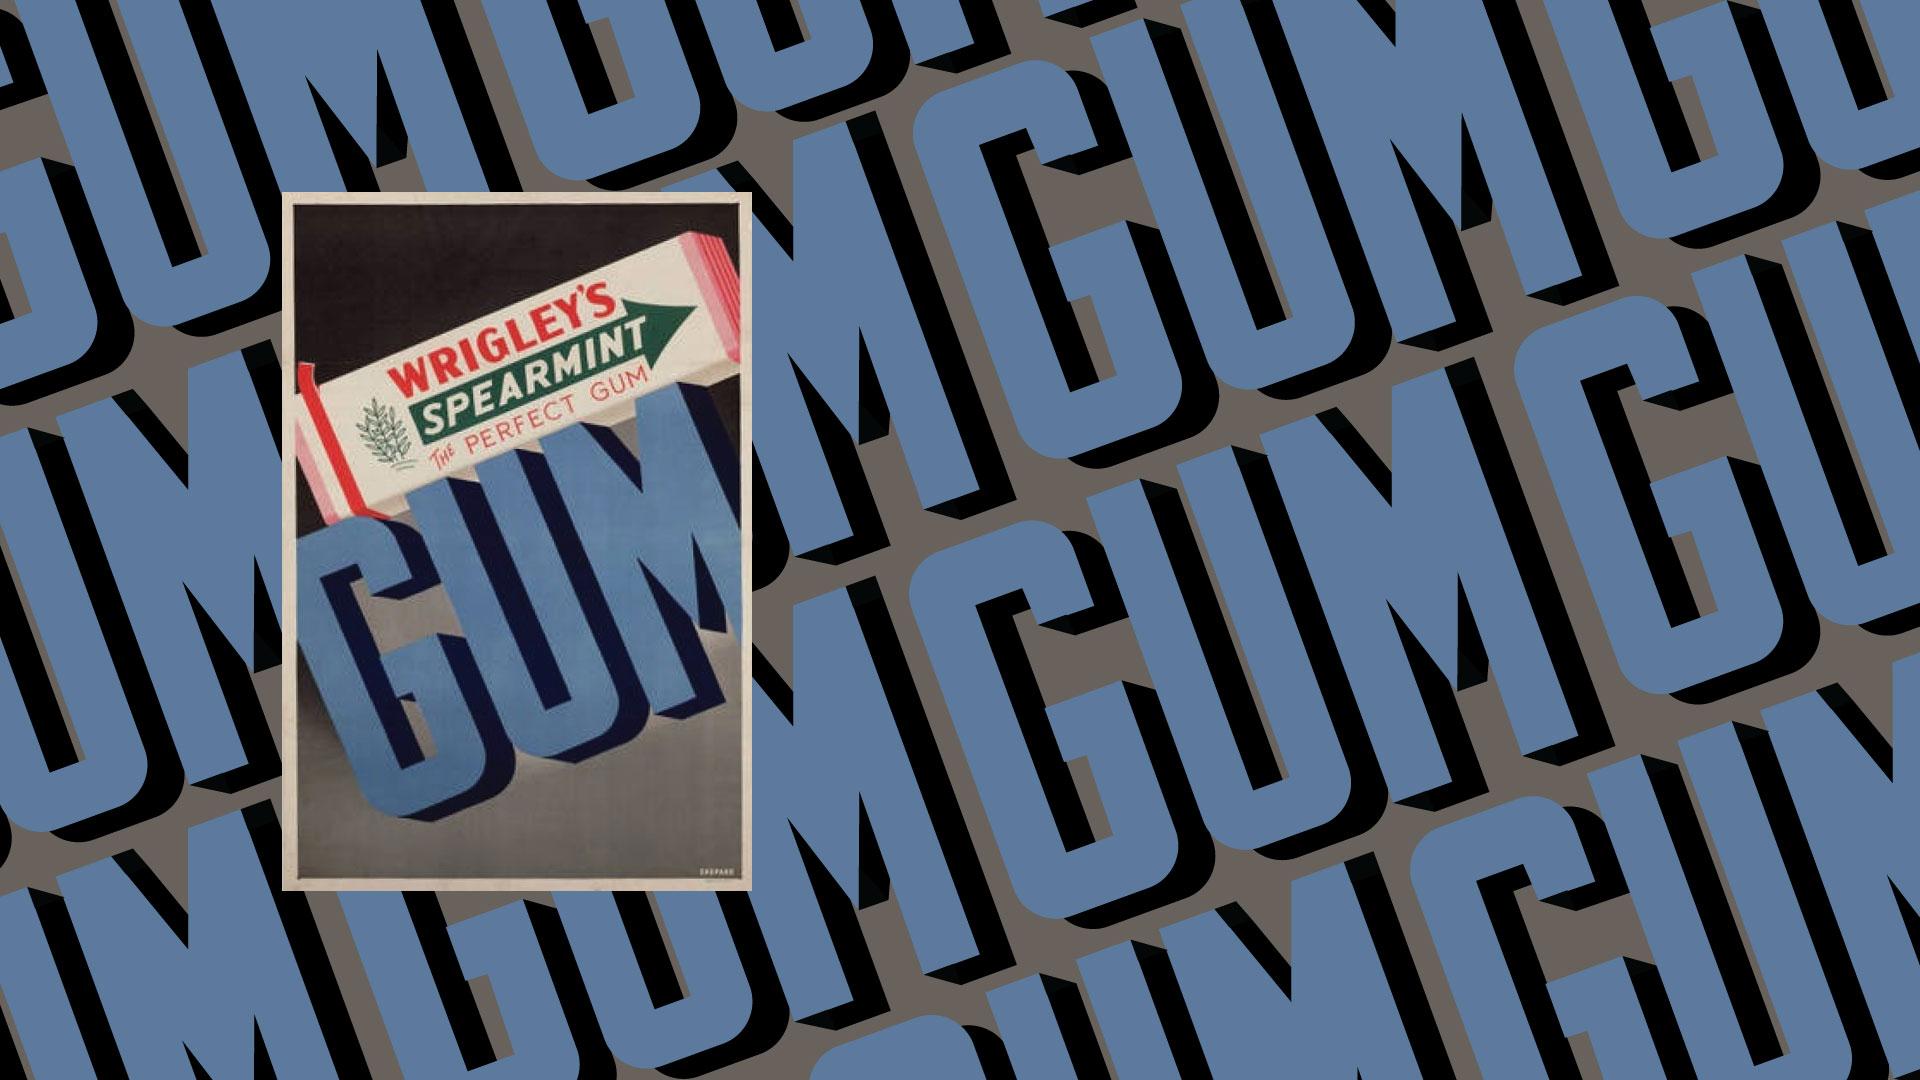 Otis Shepard Wrigley Gum